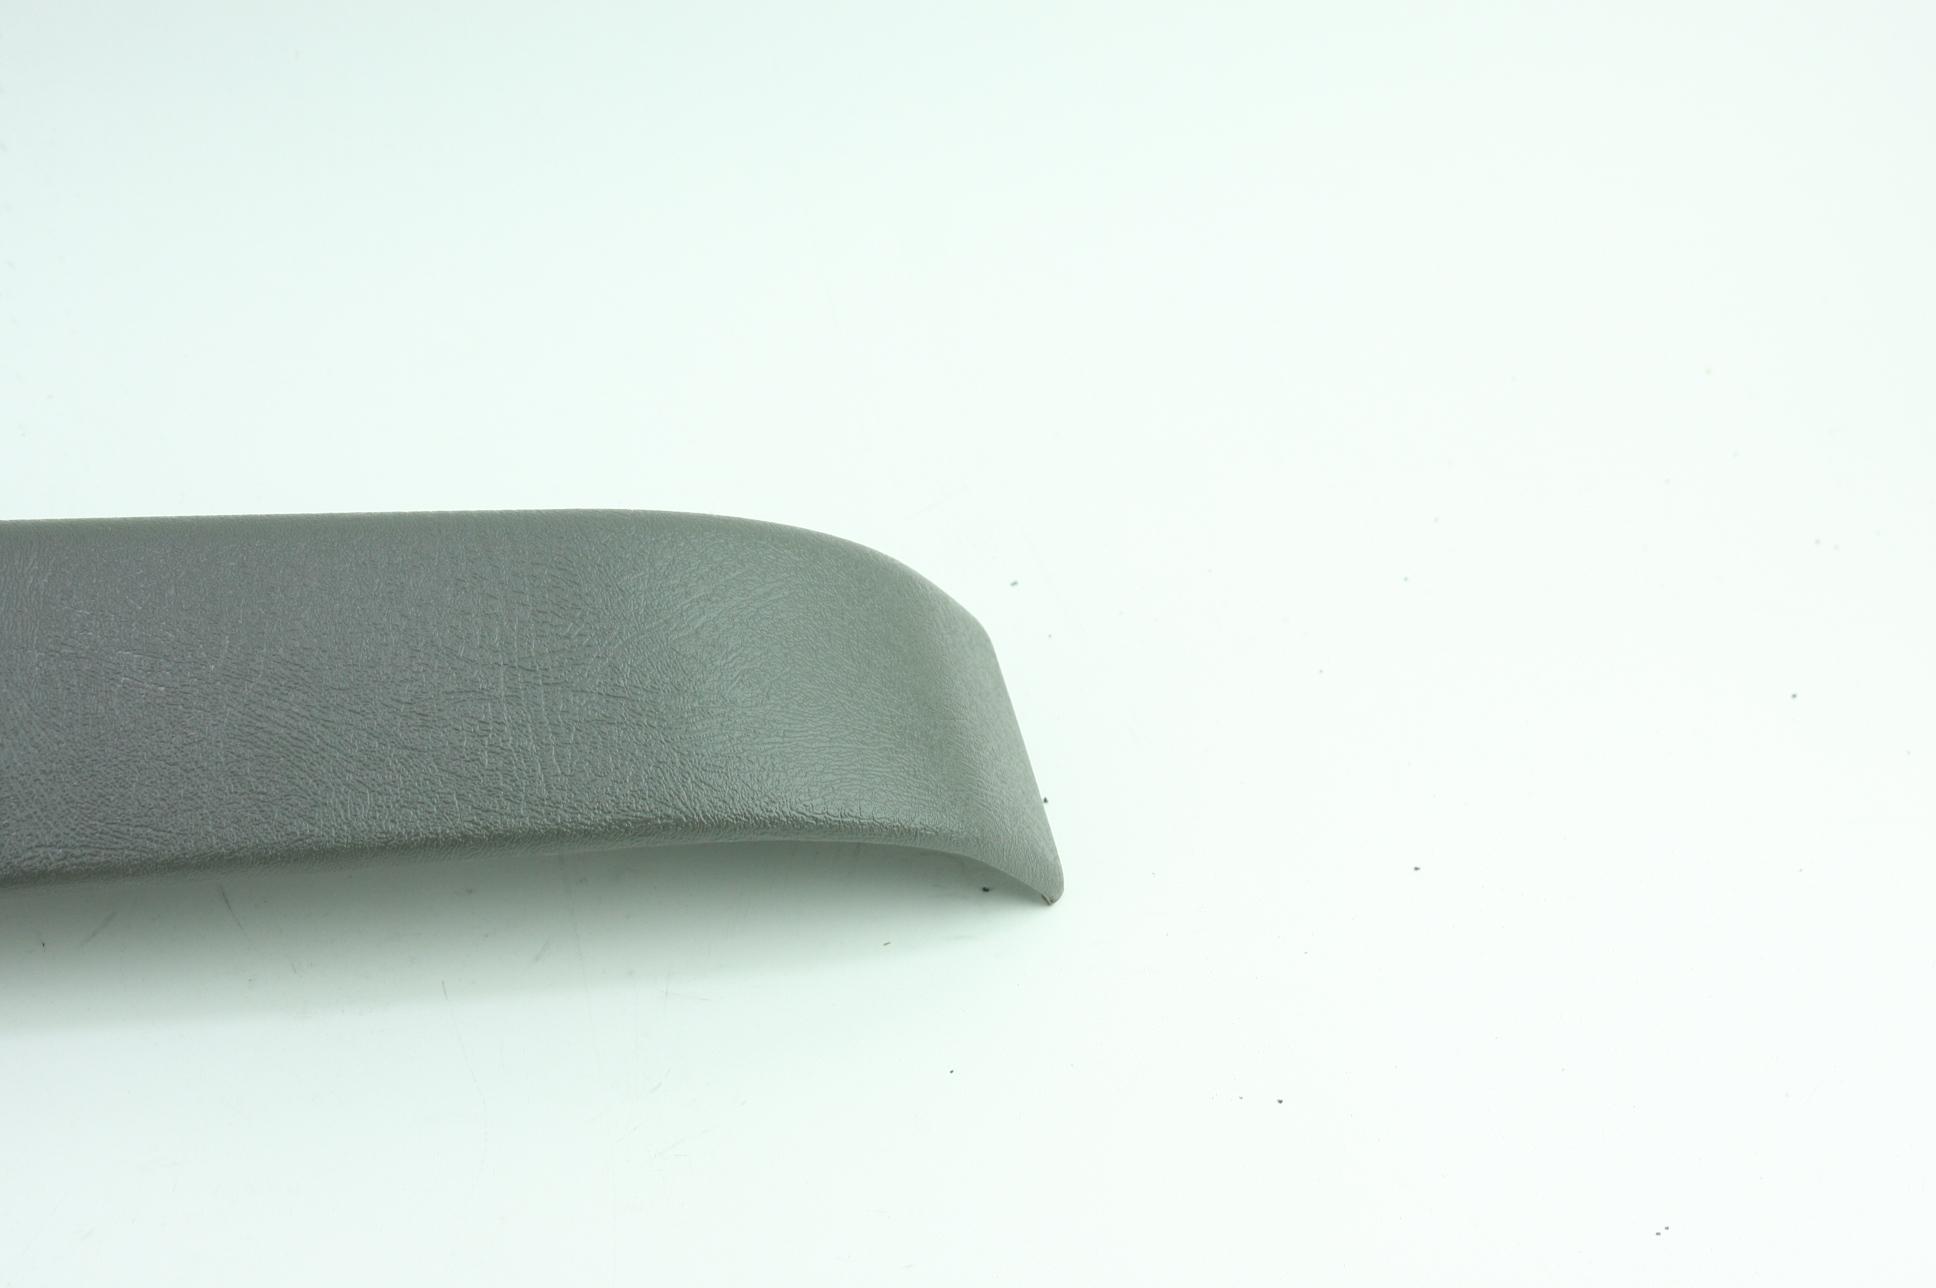 * New OEM 10388387 GM Express Savana Passenger Door Armrest Handle Pewter Gray - image 4